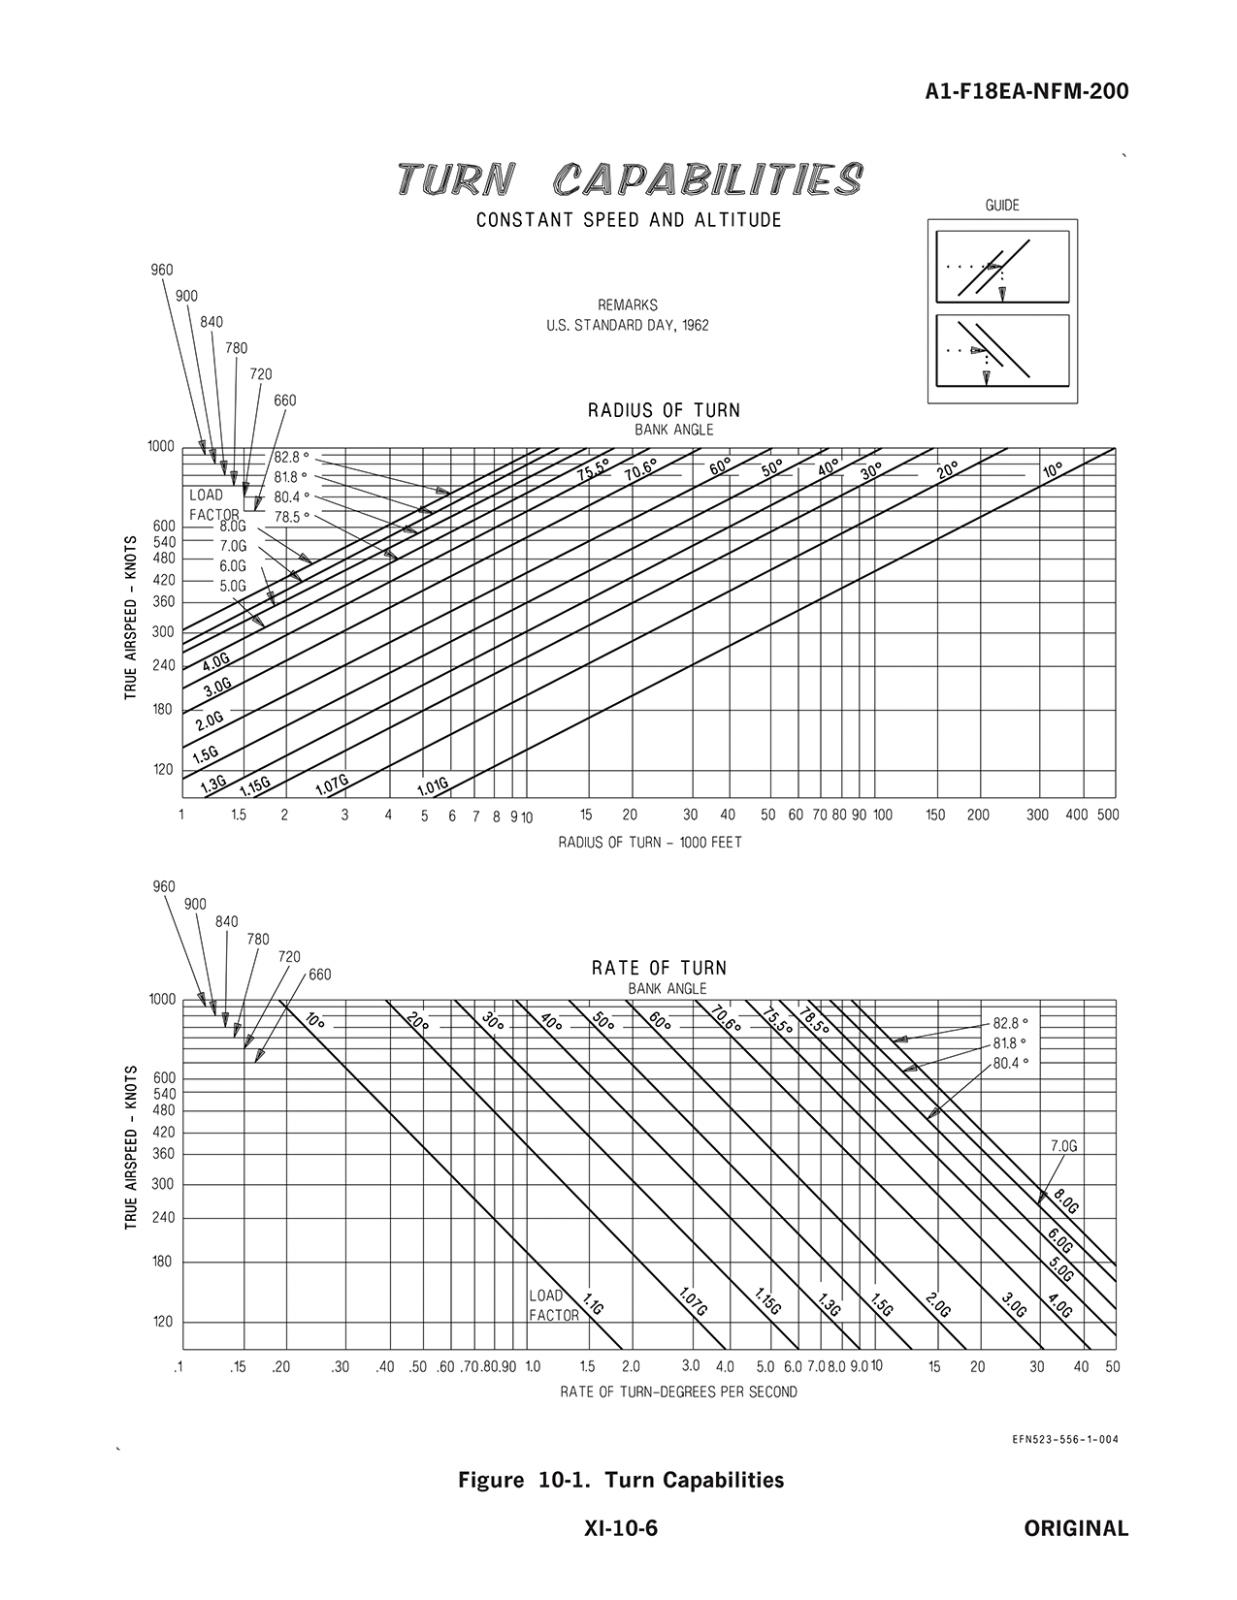 F-18 Turn Capabilities.png